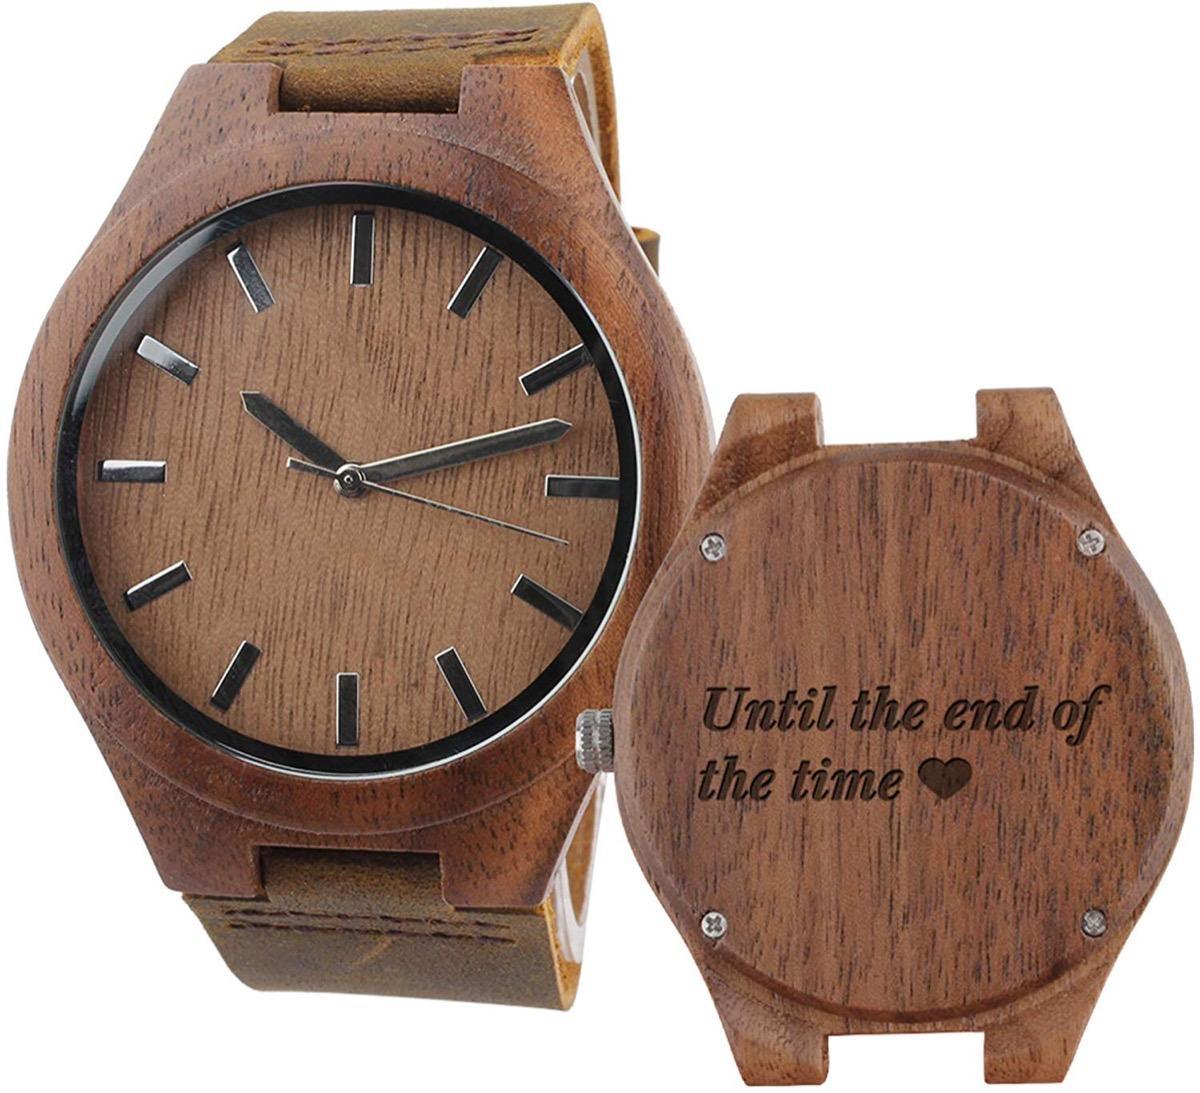 Men's customized wooden watch